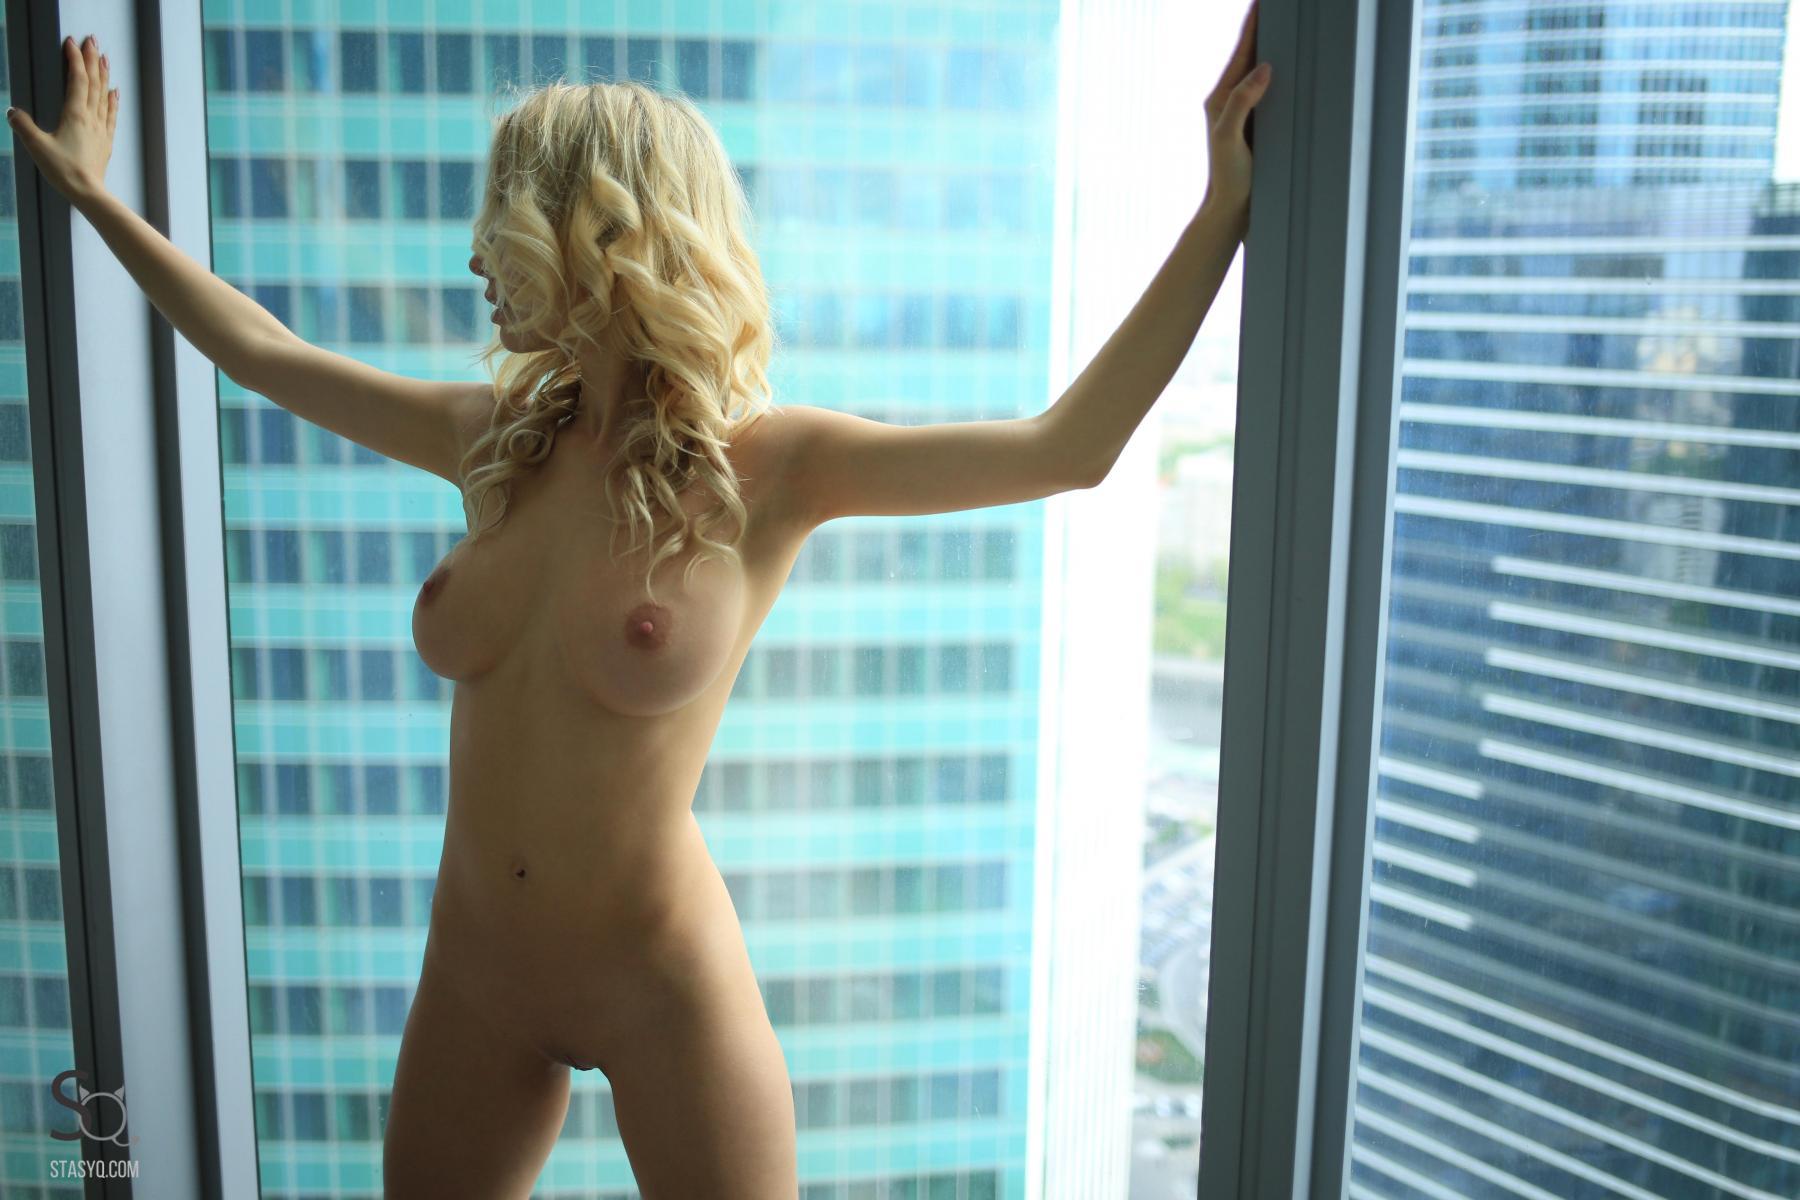 monroq-blonde-boobs-naked-bathroom-window-stasyq-29